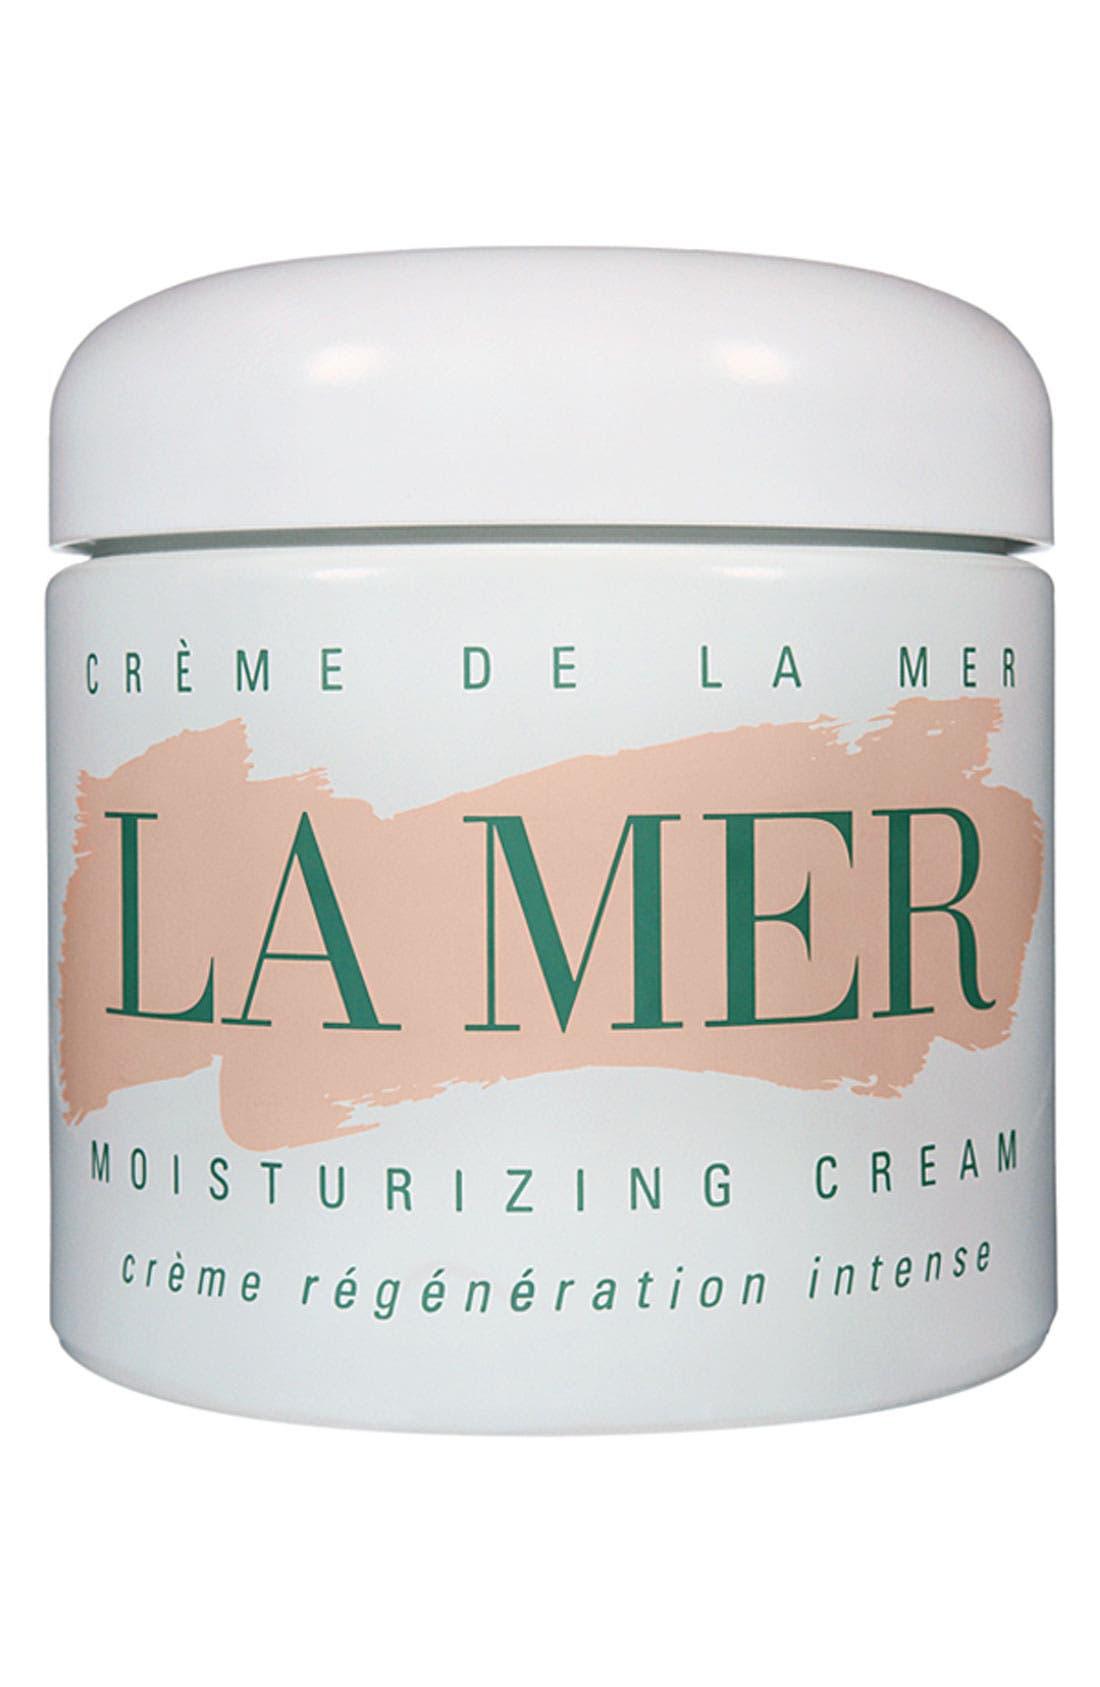 Crème de la Mer Moisturizing Cream (16.5 oz.) ($2,805 Value)